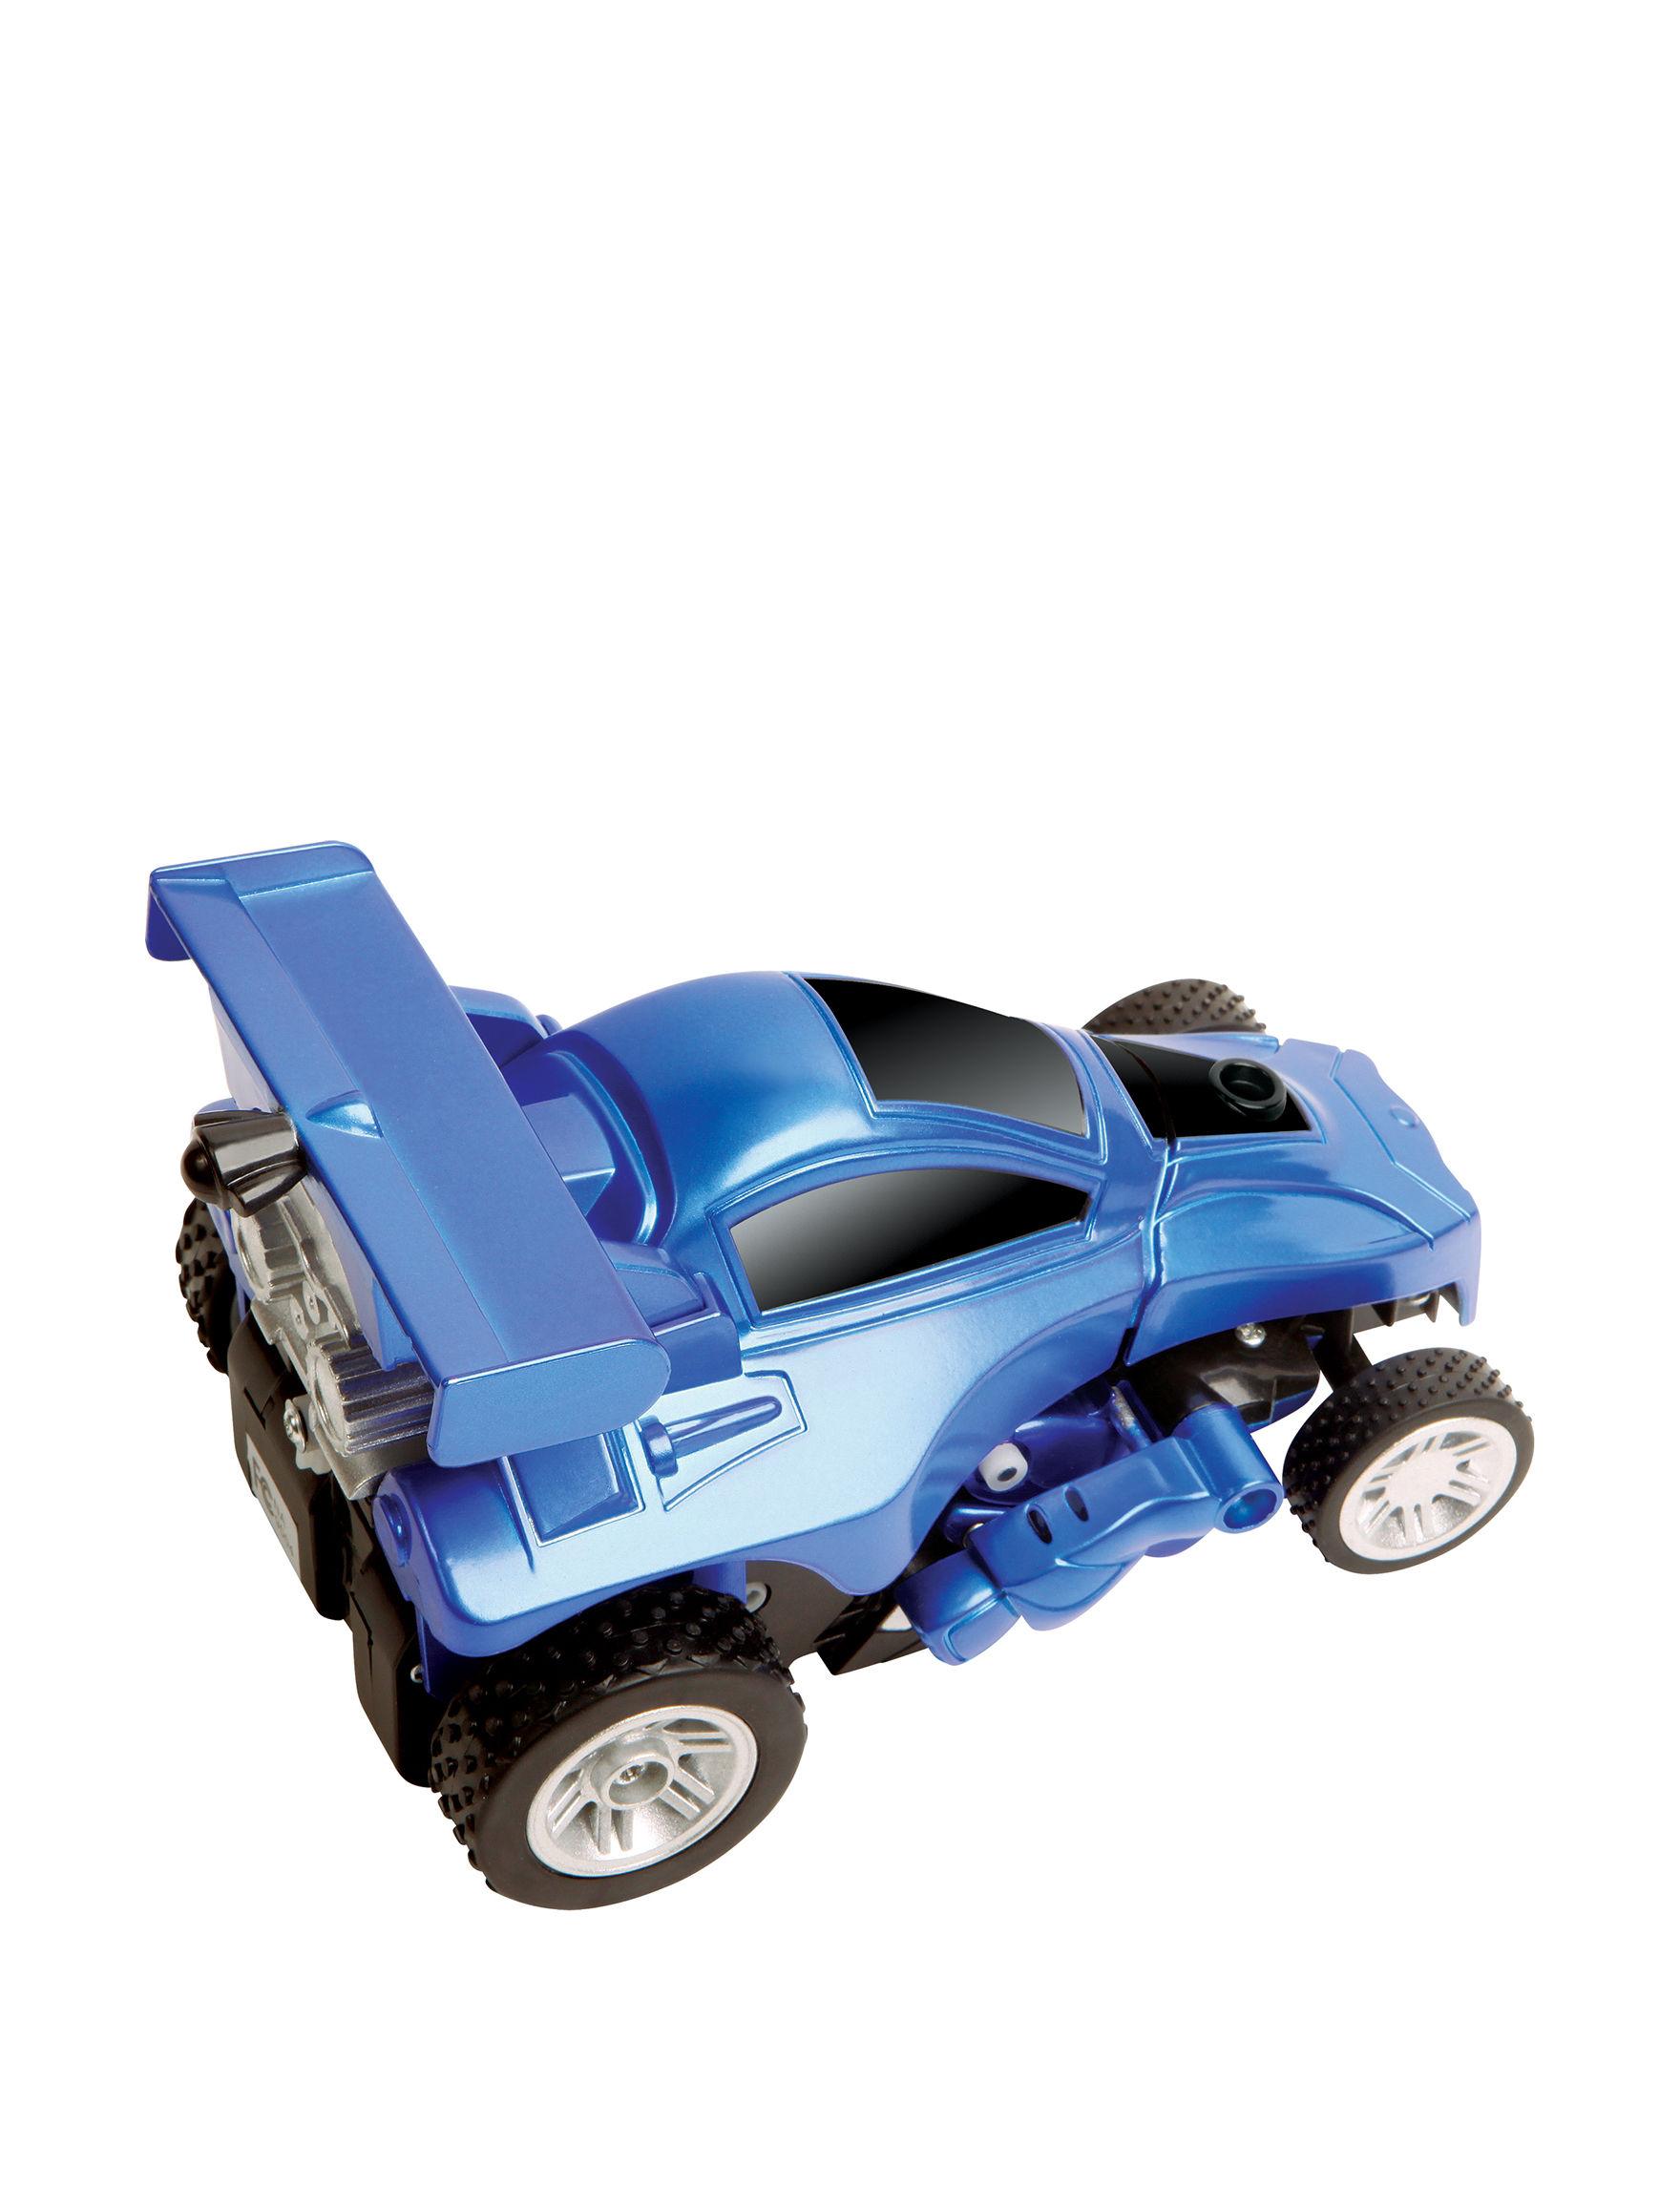 Lowepro Adventura Sh 120 Ii Shoulder Bag Black Deals2look The Series Toy Rc Robot Jr Blue